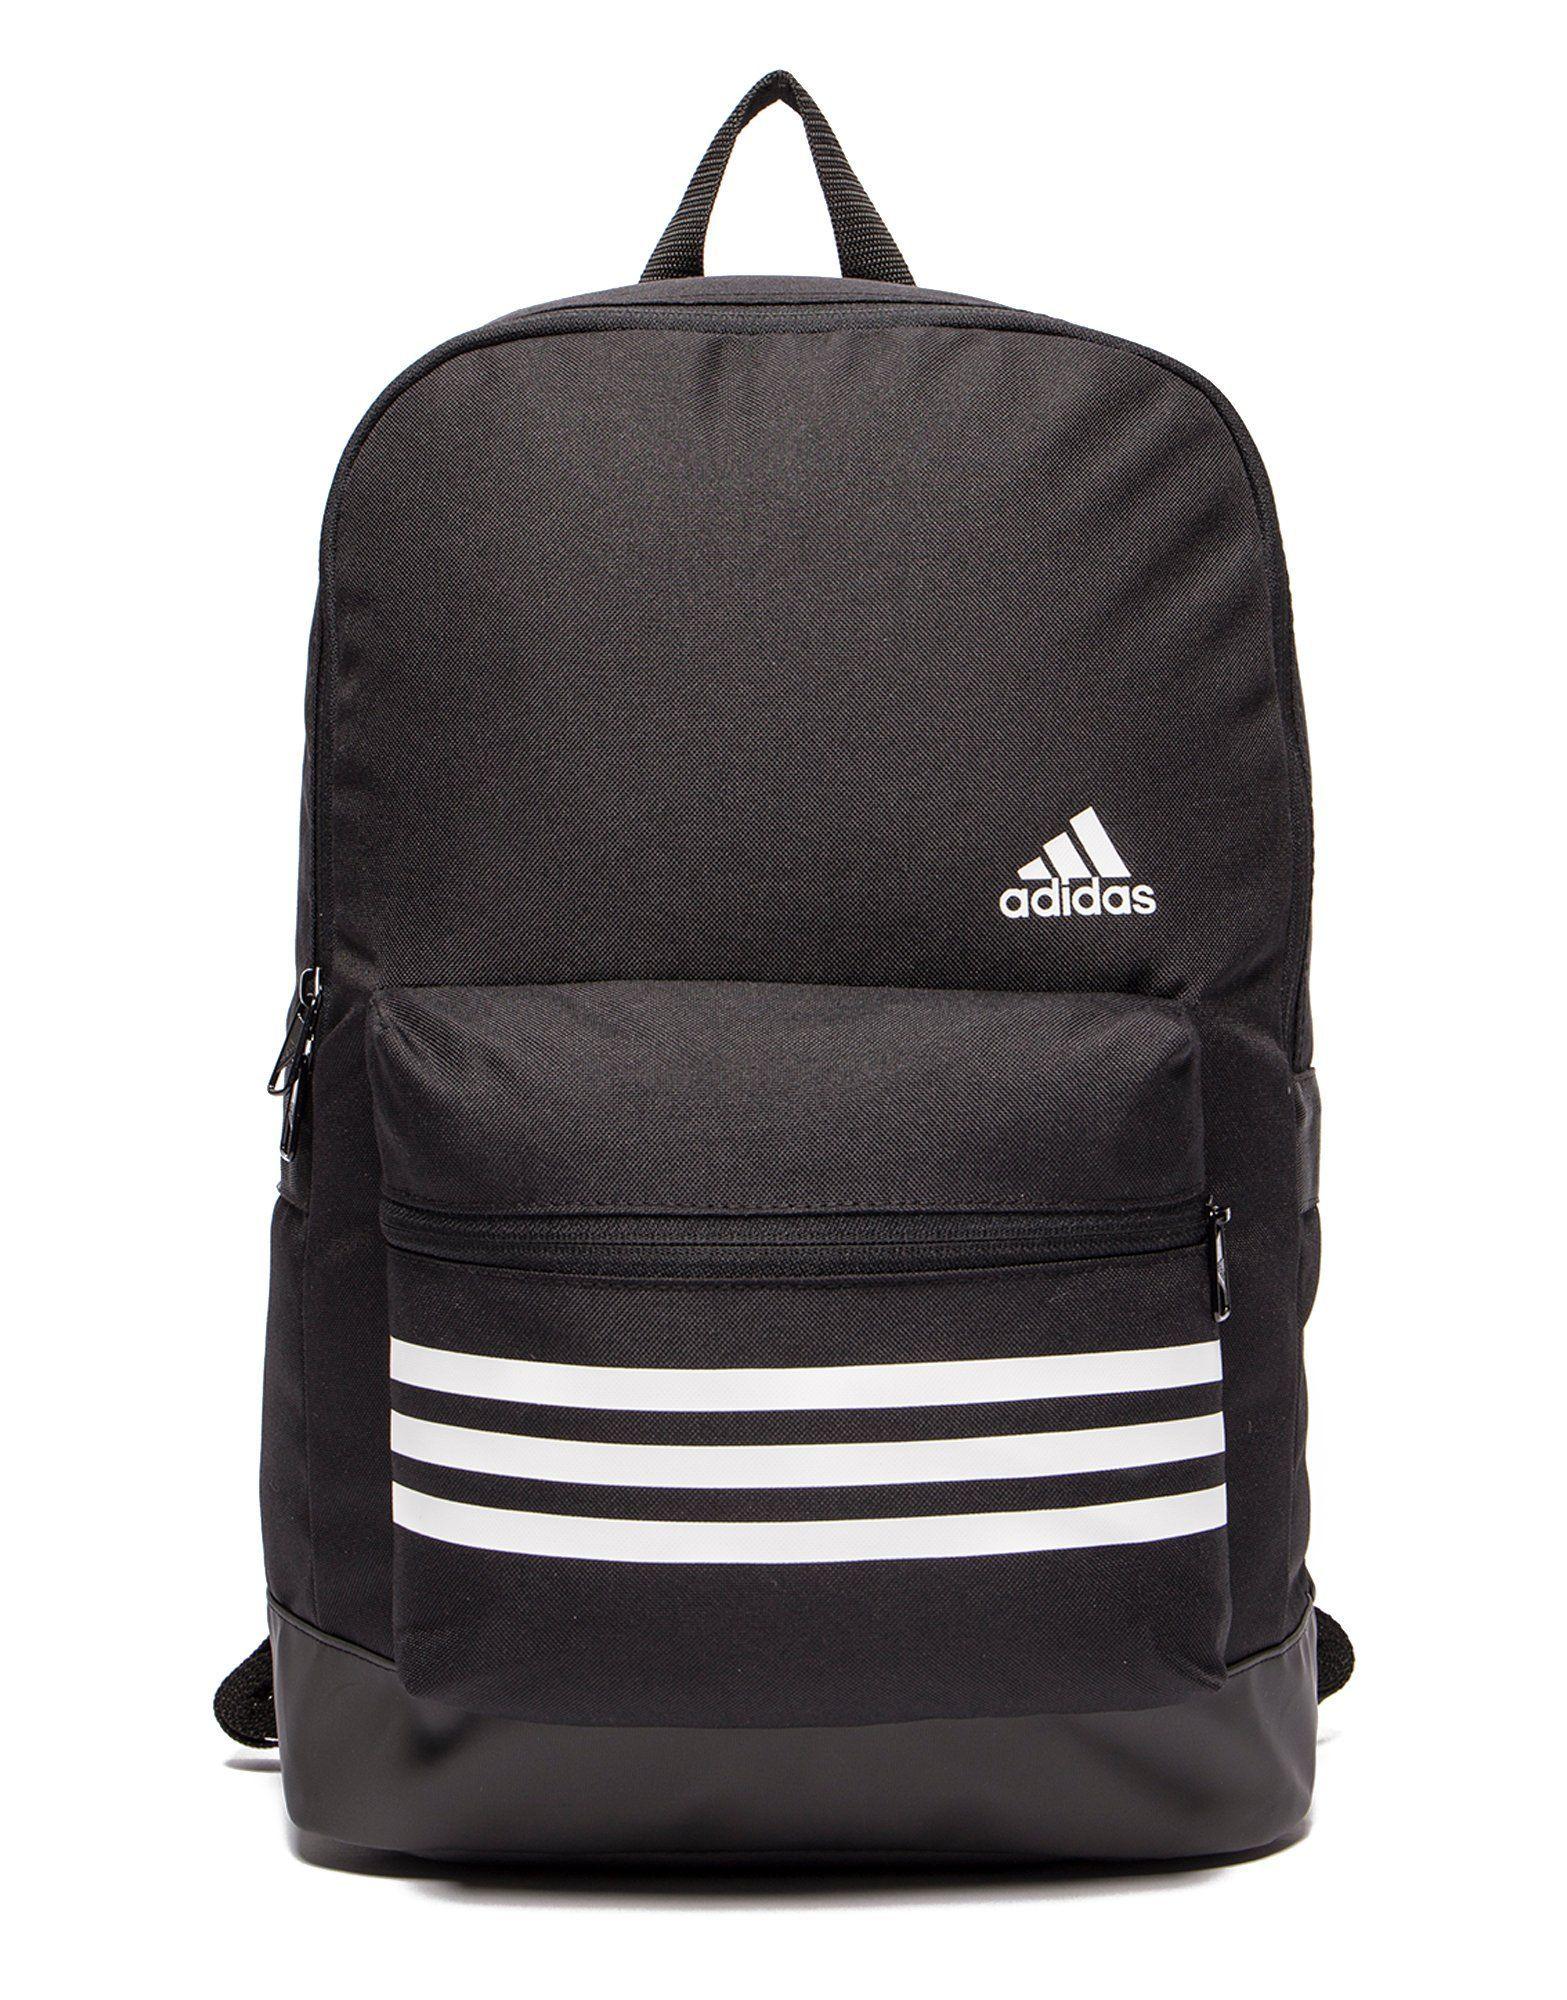 adidas Versatile Backpack Backpacks, Fashion backpack